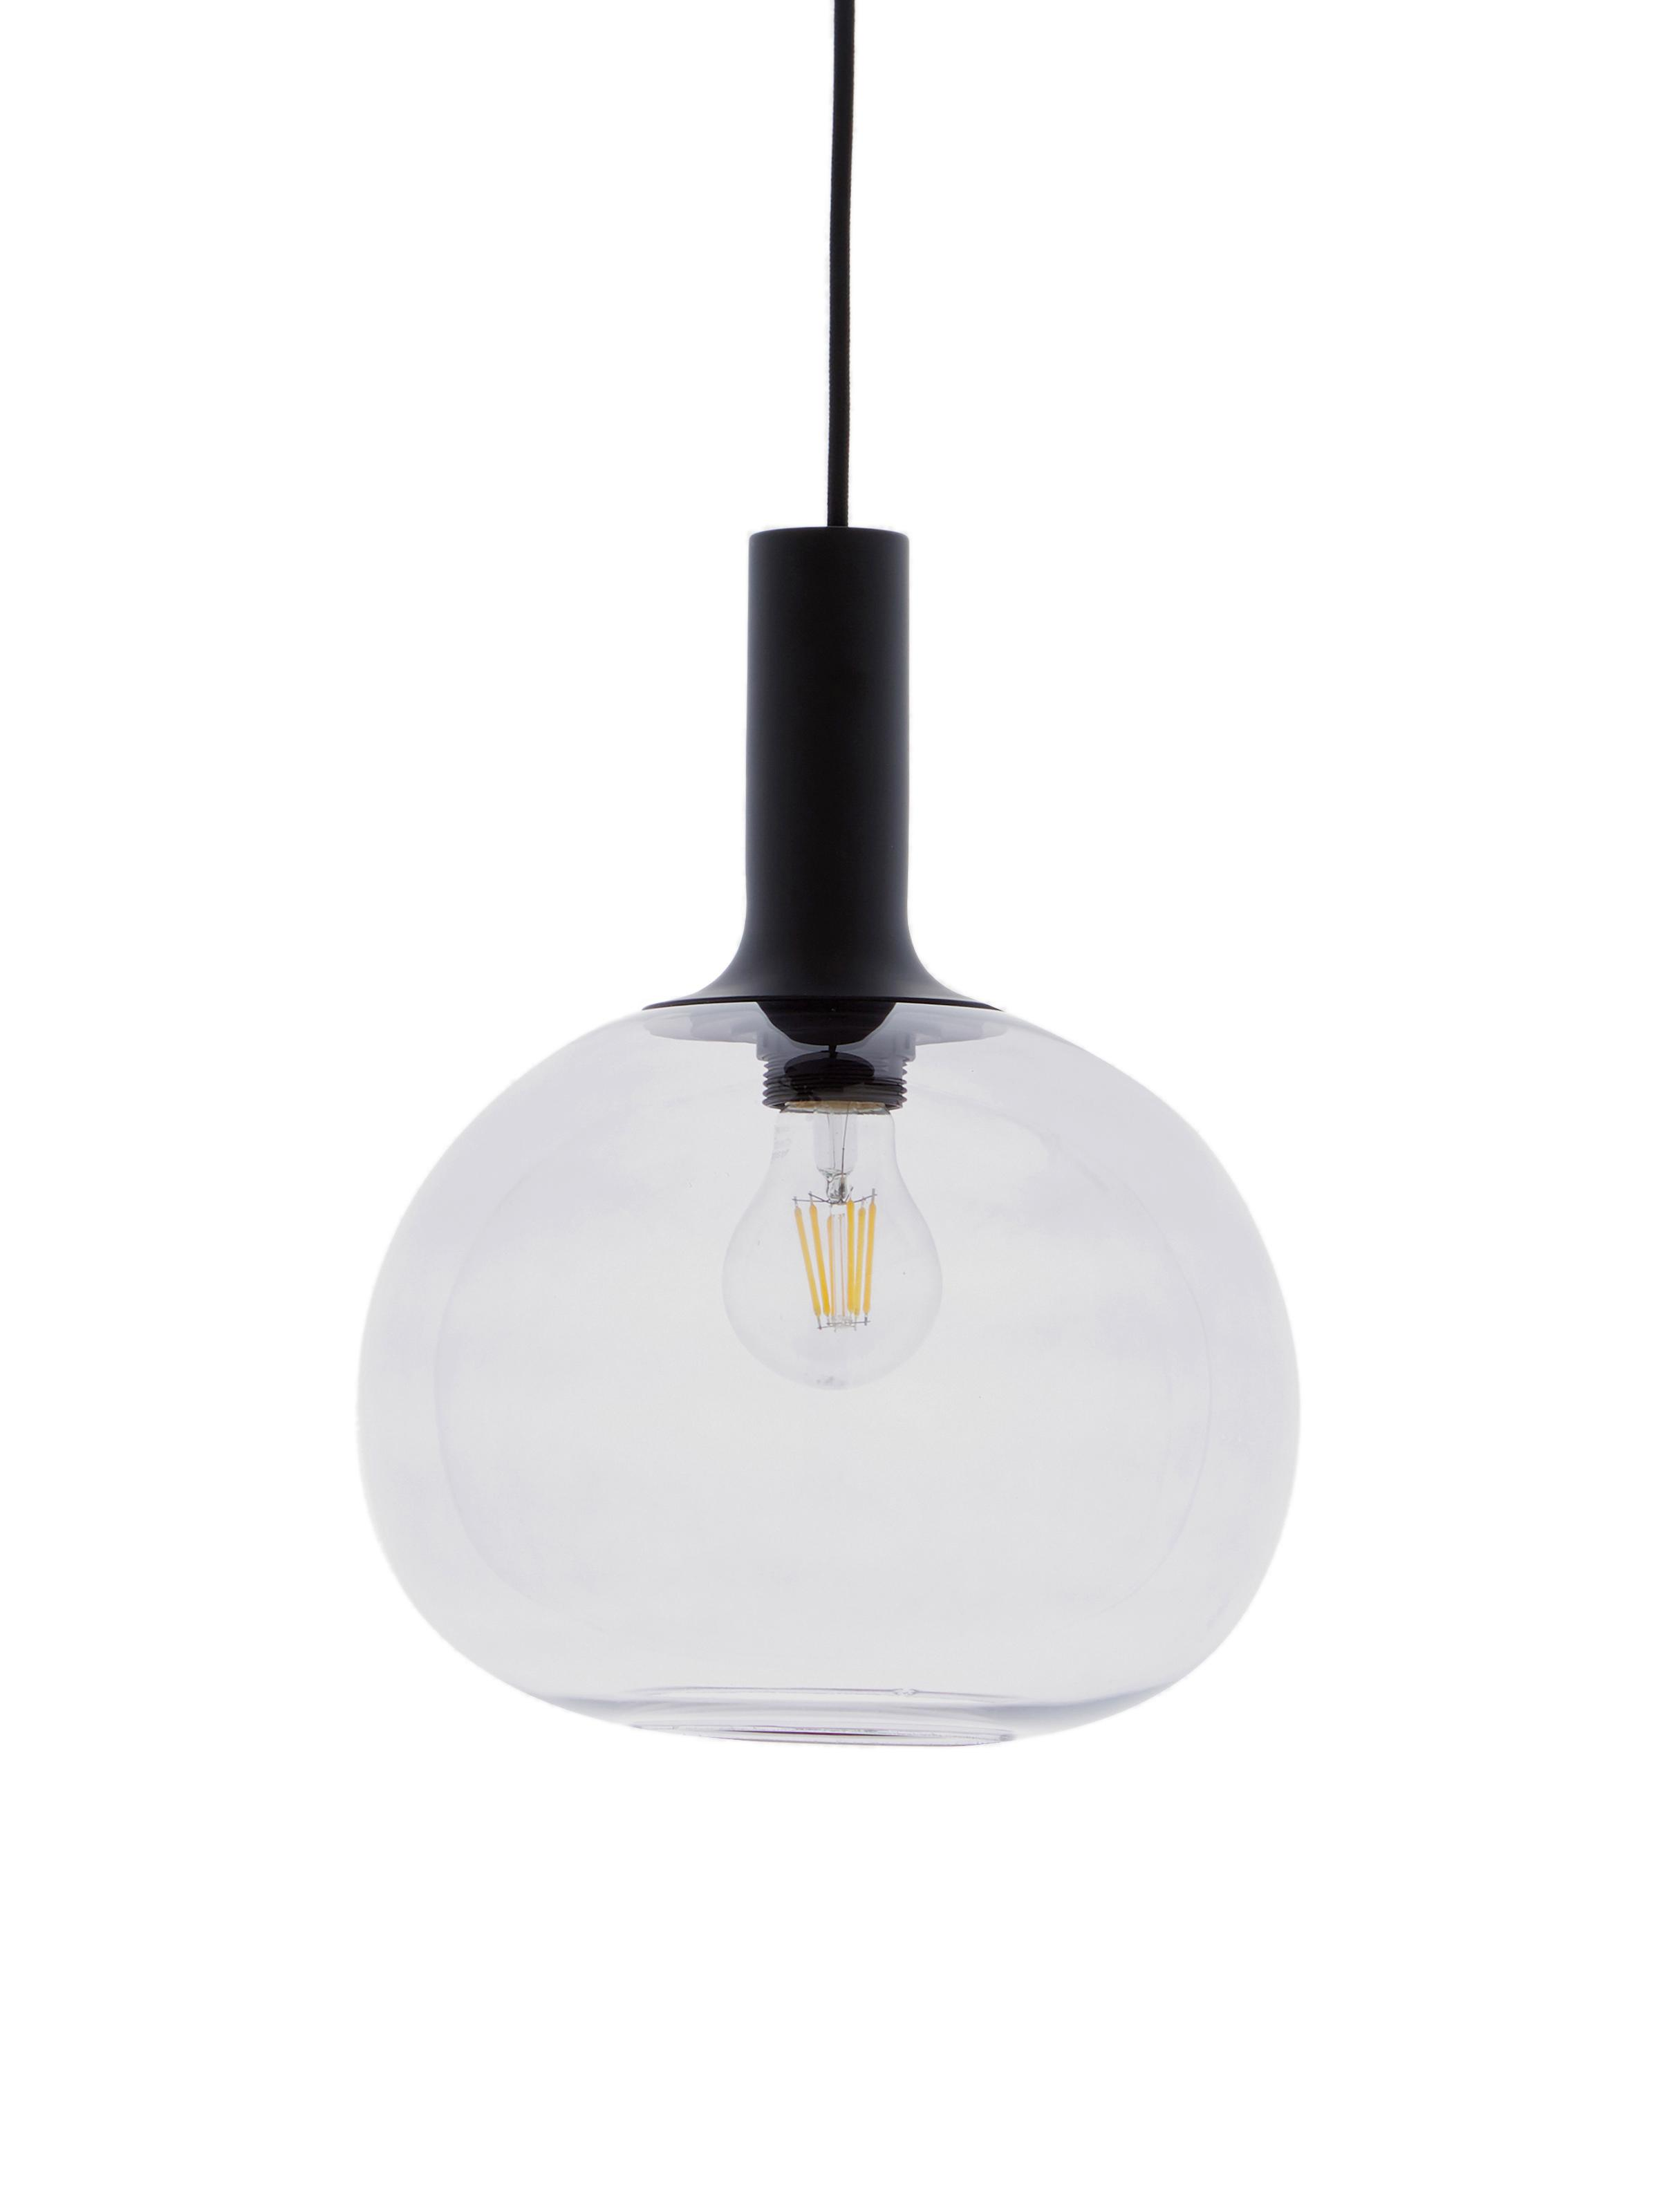 Hanglamp Alton, Lampenkap: glas, Zwart, grijs, transparant, Ø 25 x H 33 cm